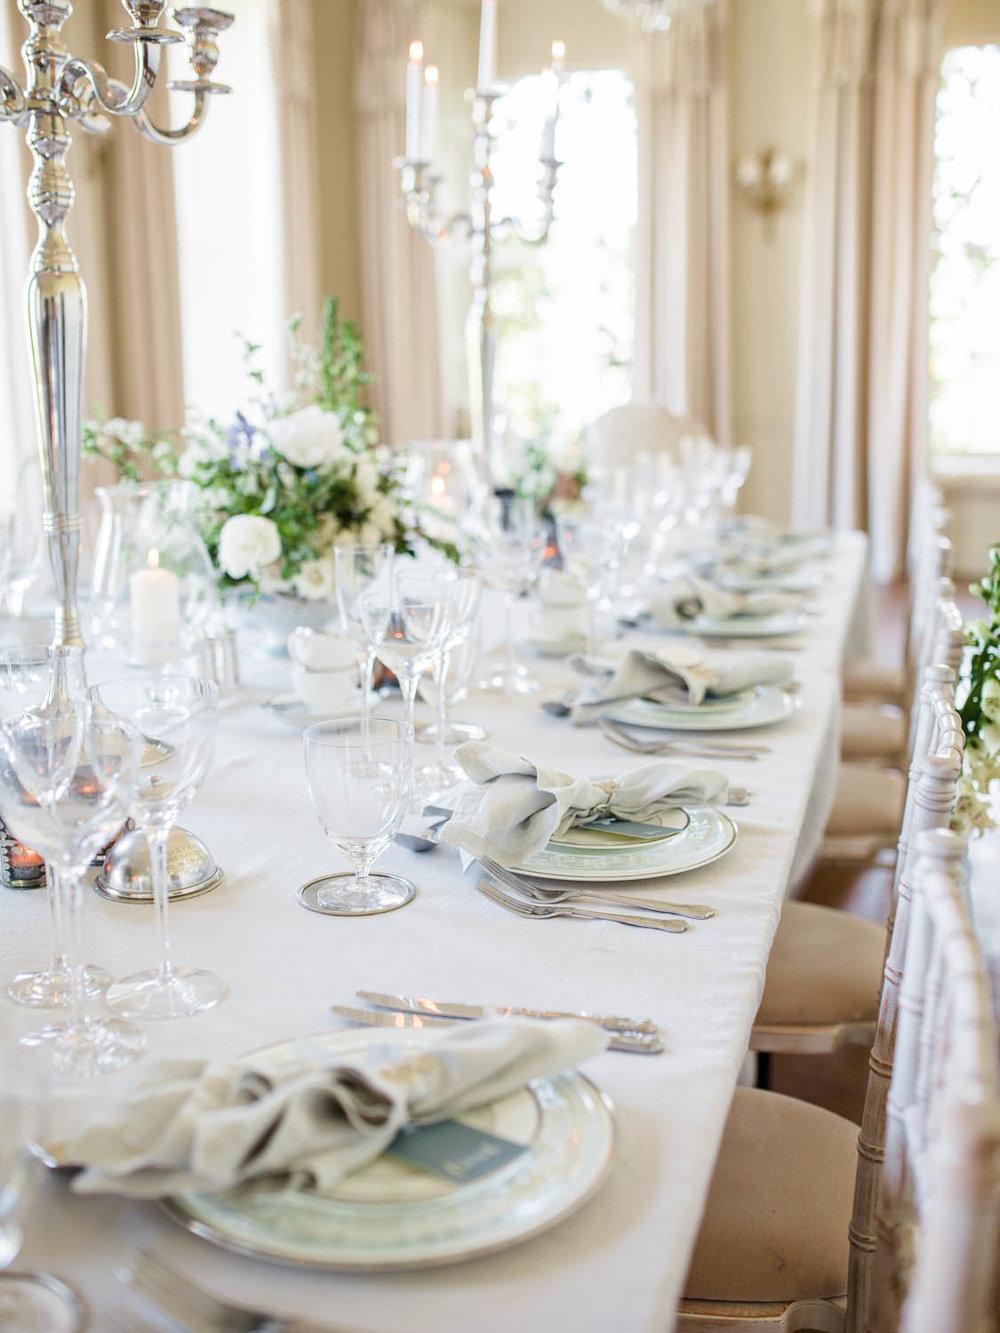 Amy O'Boyle Photography, Destination & UK Fine Art Film Wedding Photographer, Pynes House Wedding Devon-8.jpg